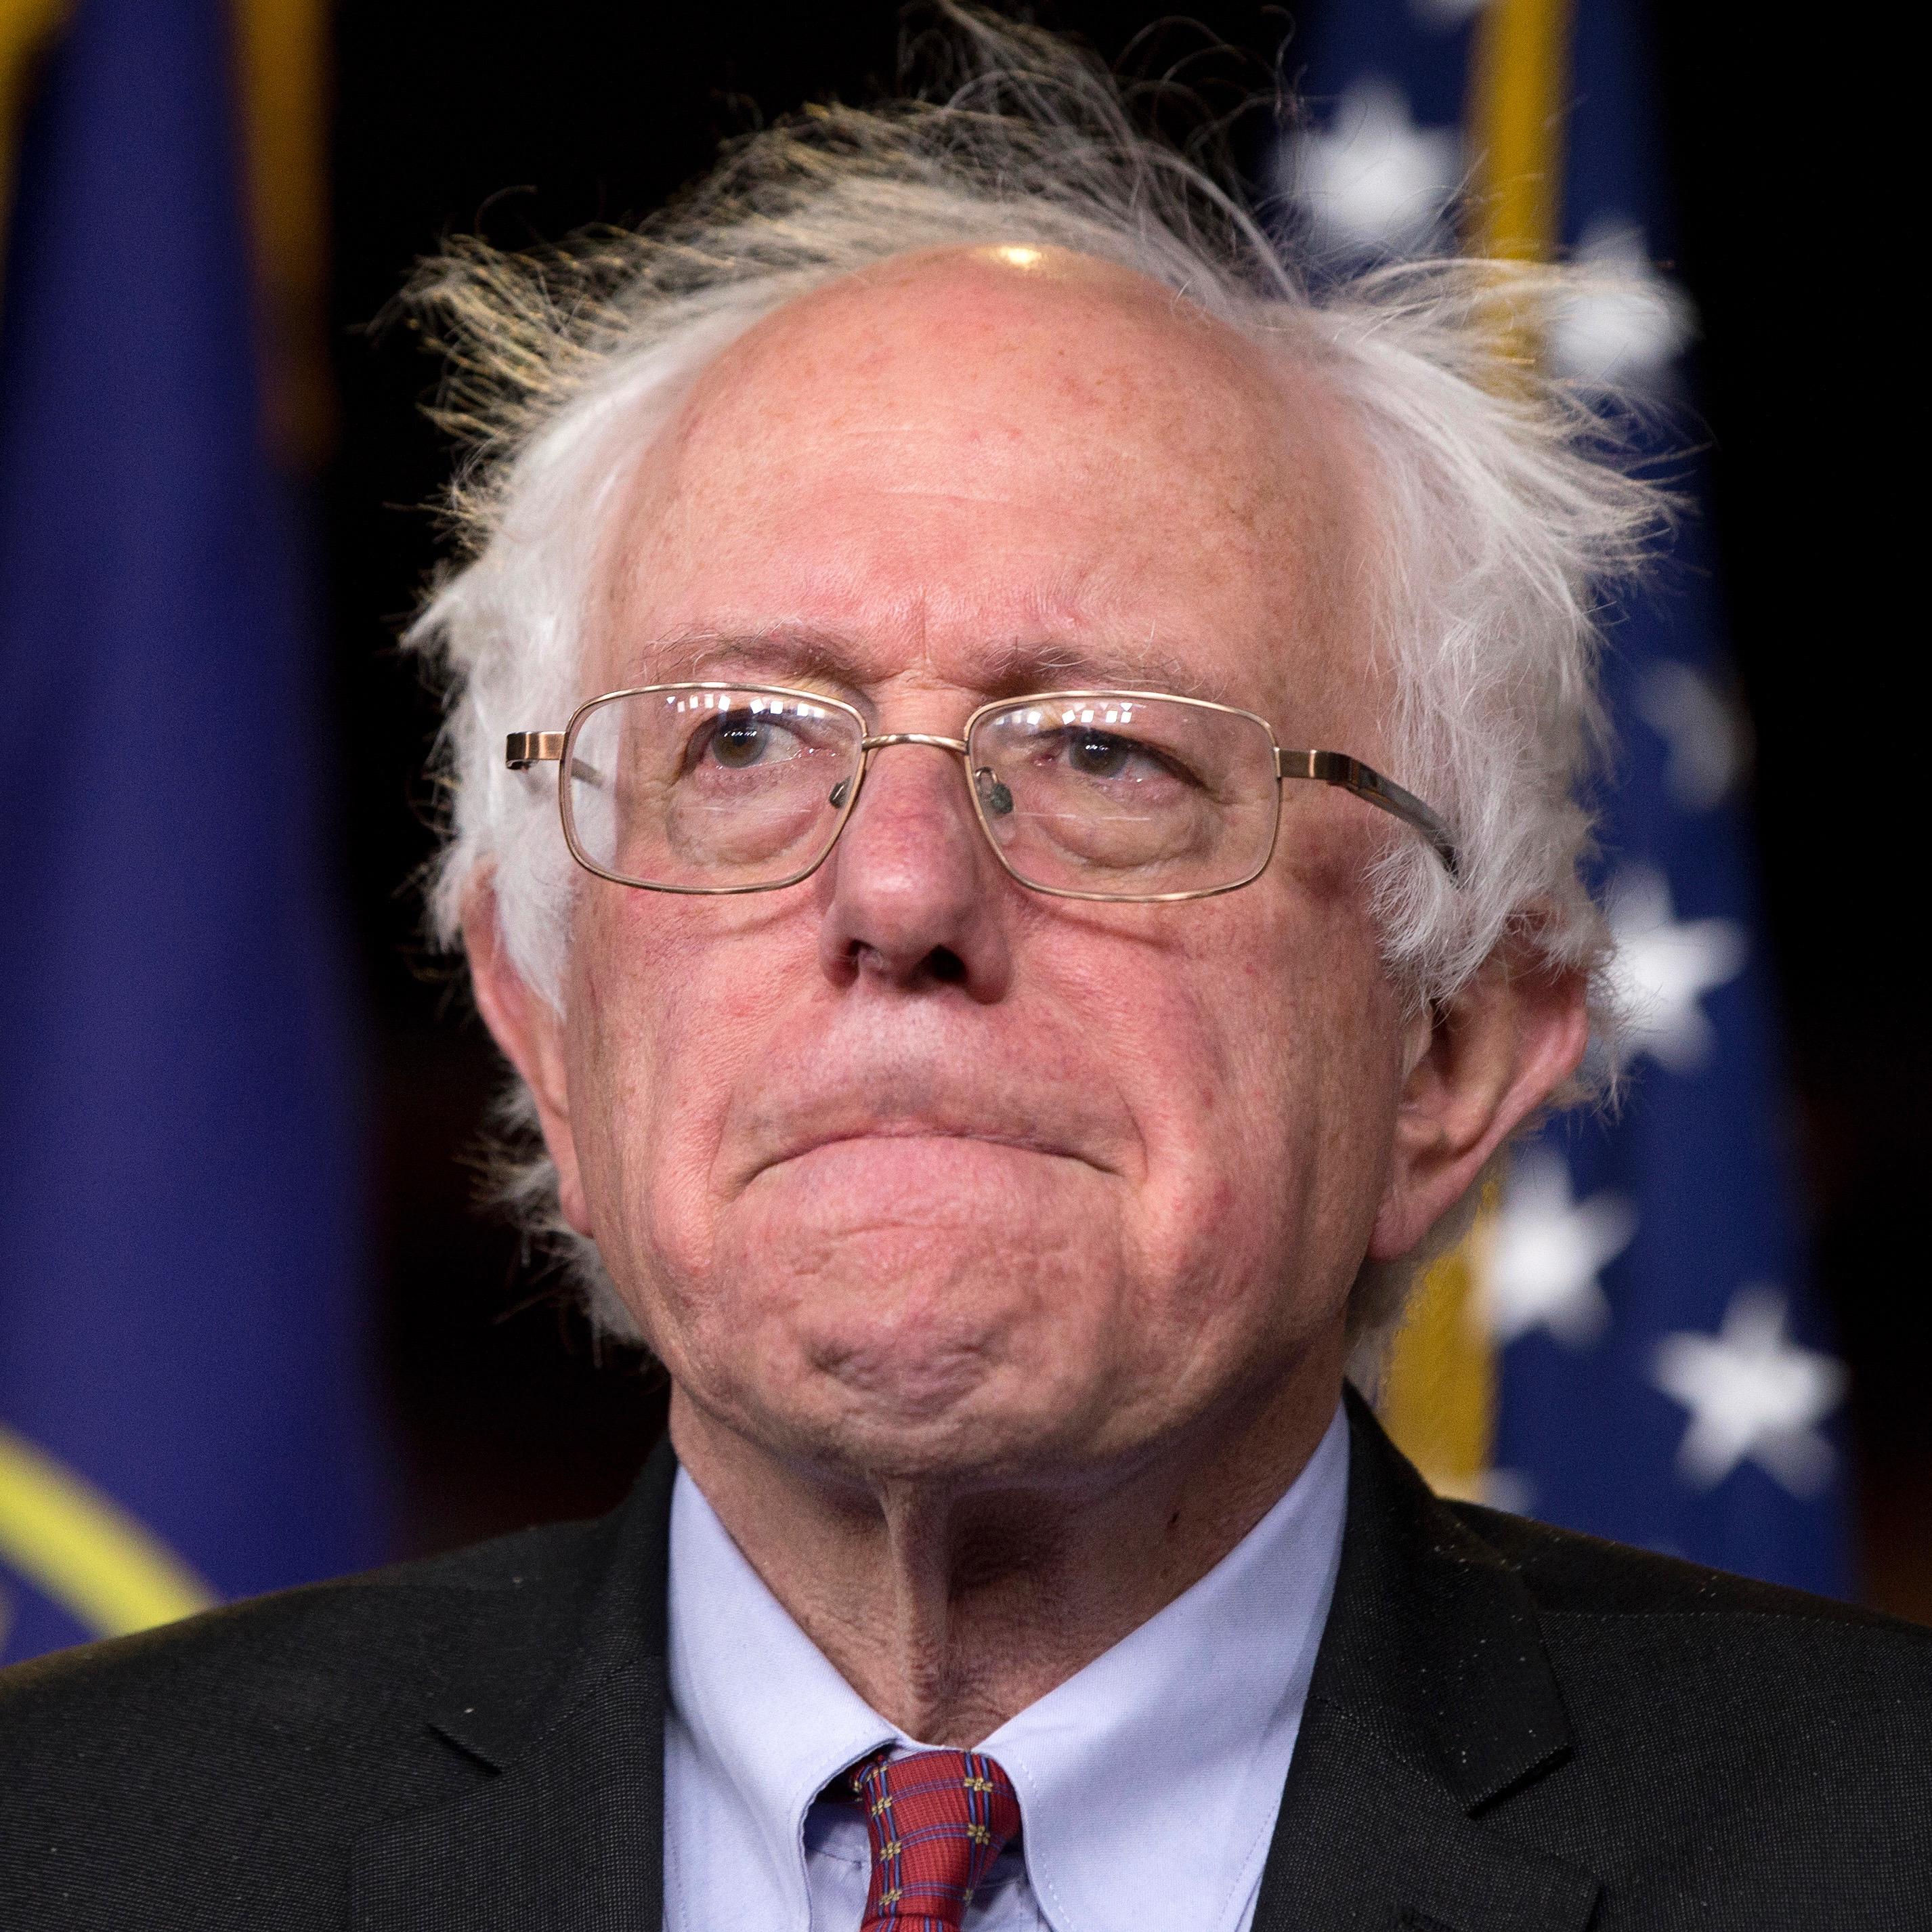 Bernie Sanders Gets A Clue, Says Tax Cut Bill Helps Middle Class [VIDEO]